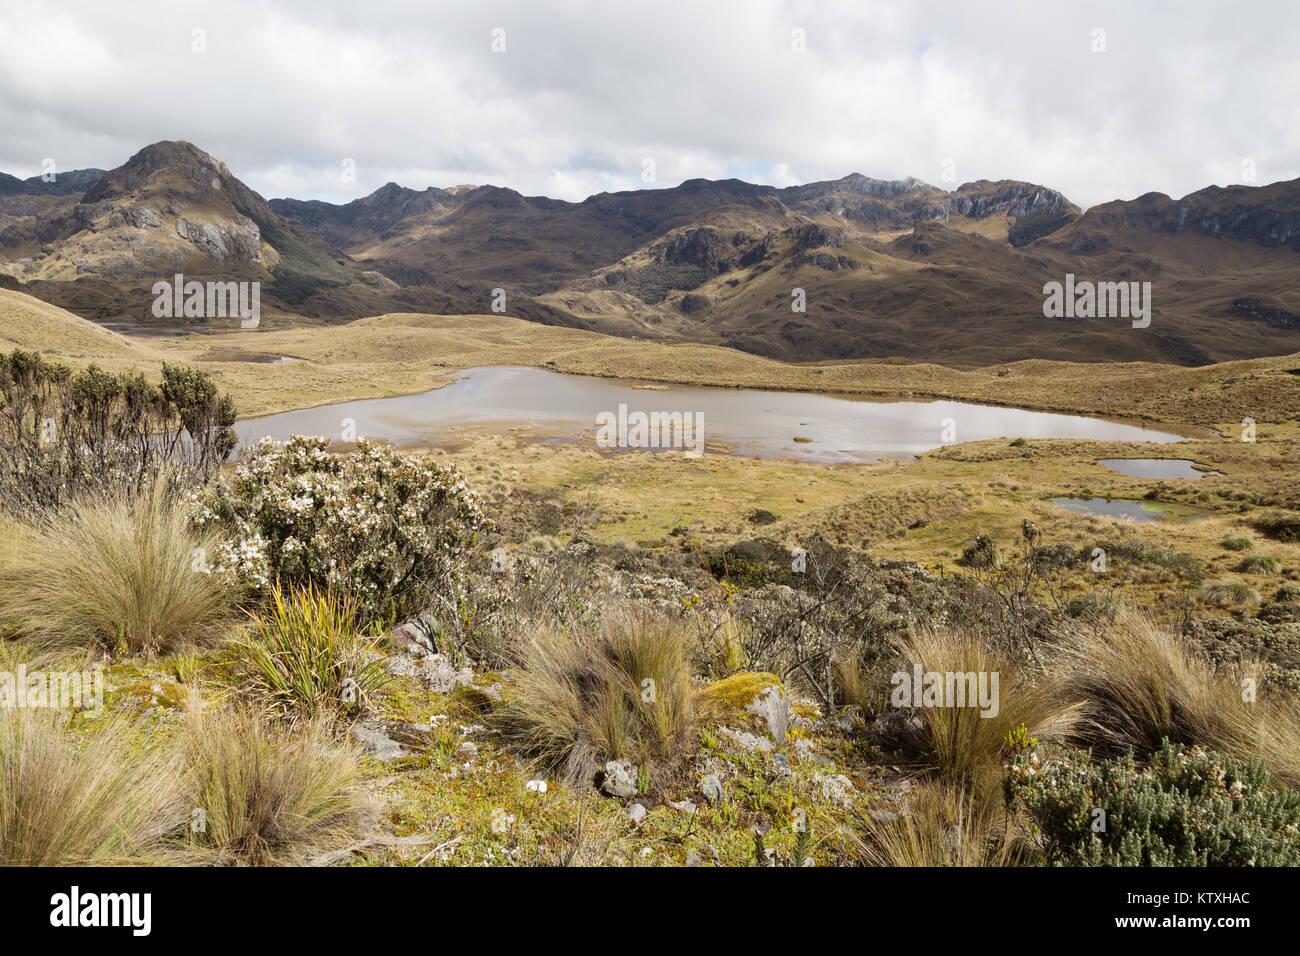 Ecuador Landschaft - El Cajas Nationalpark (Parque Nacional Cajas), Cuenca, Ecuador Südamerika Stockbild